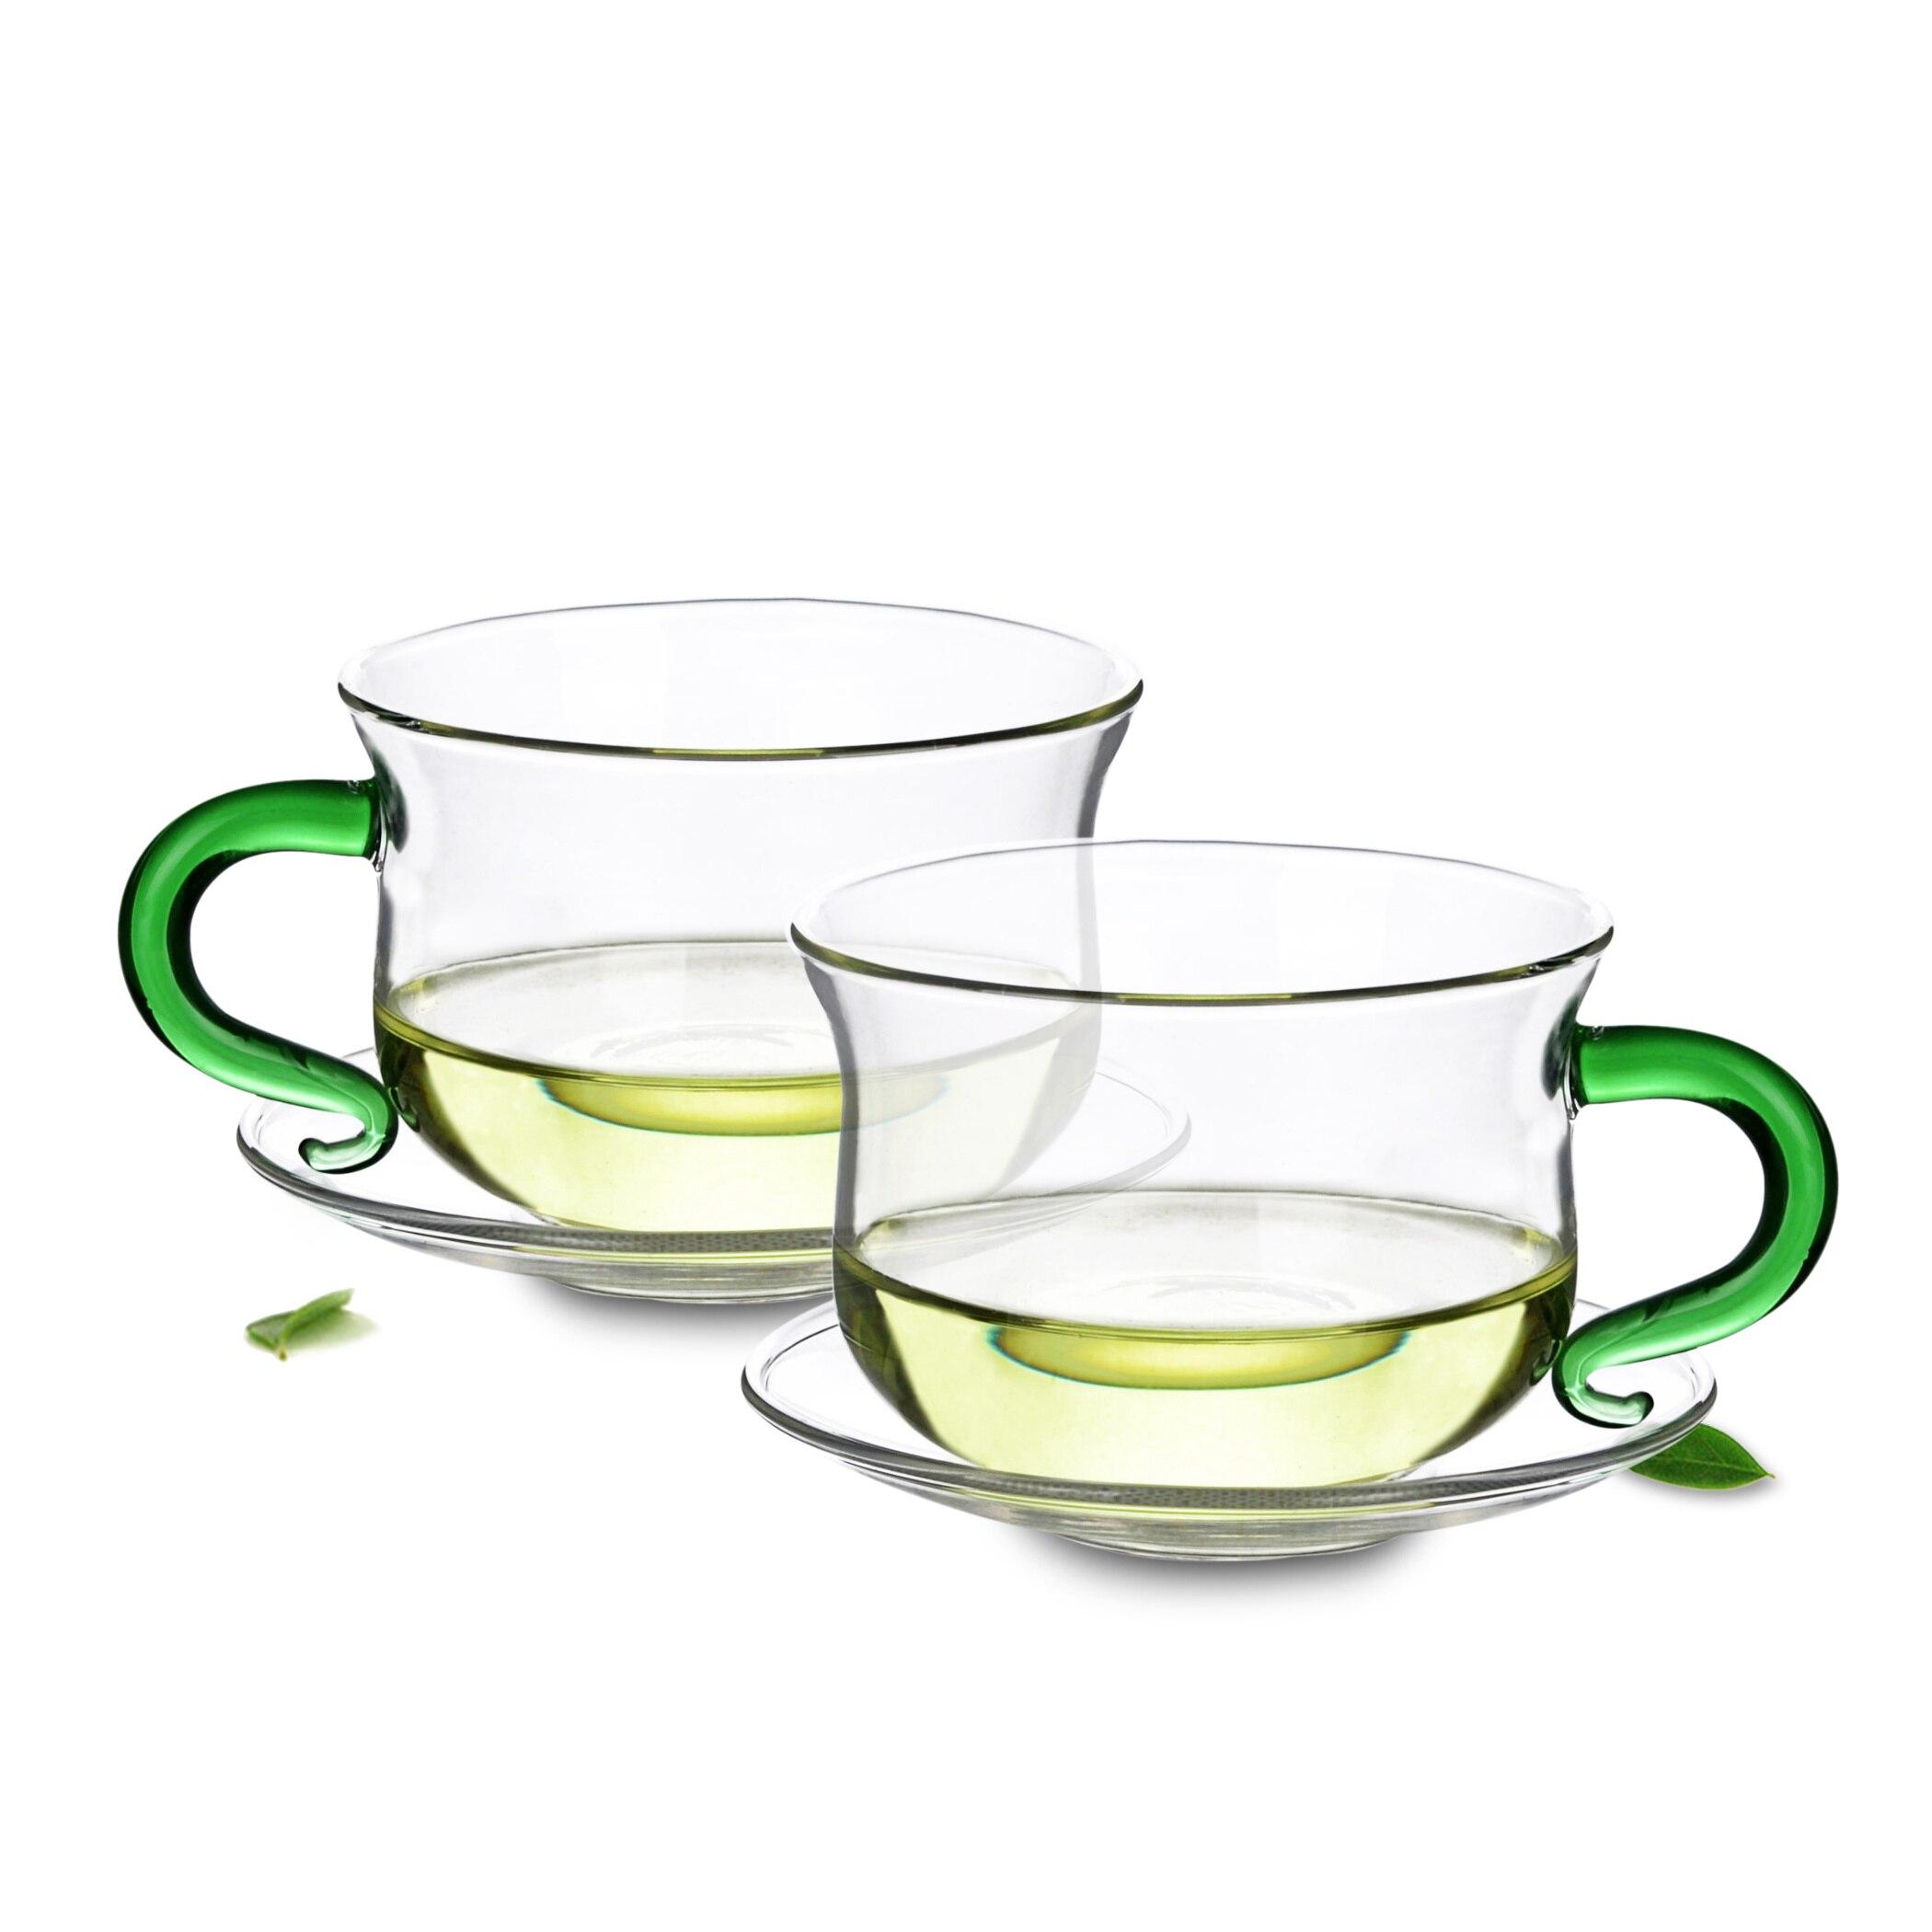 Lotes de té Set-1x 140ml Mango Verde resistente al calor taza de té de vidrio + 1x platillo 90mm